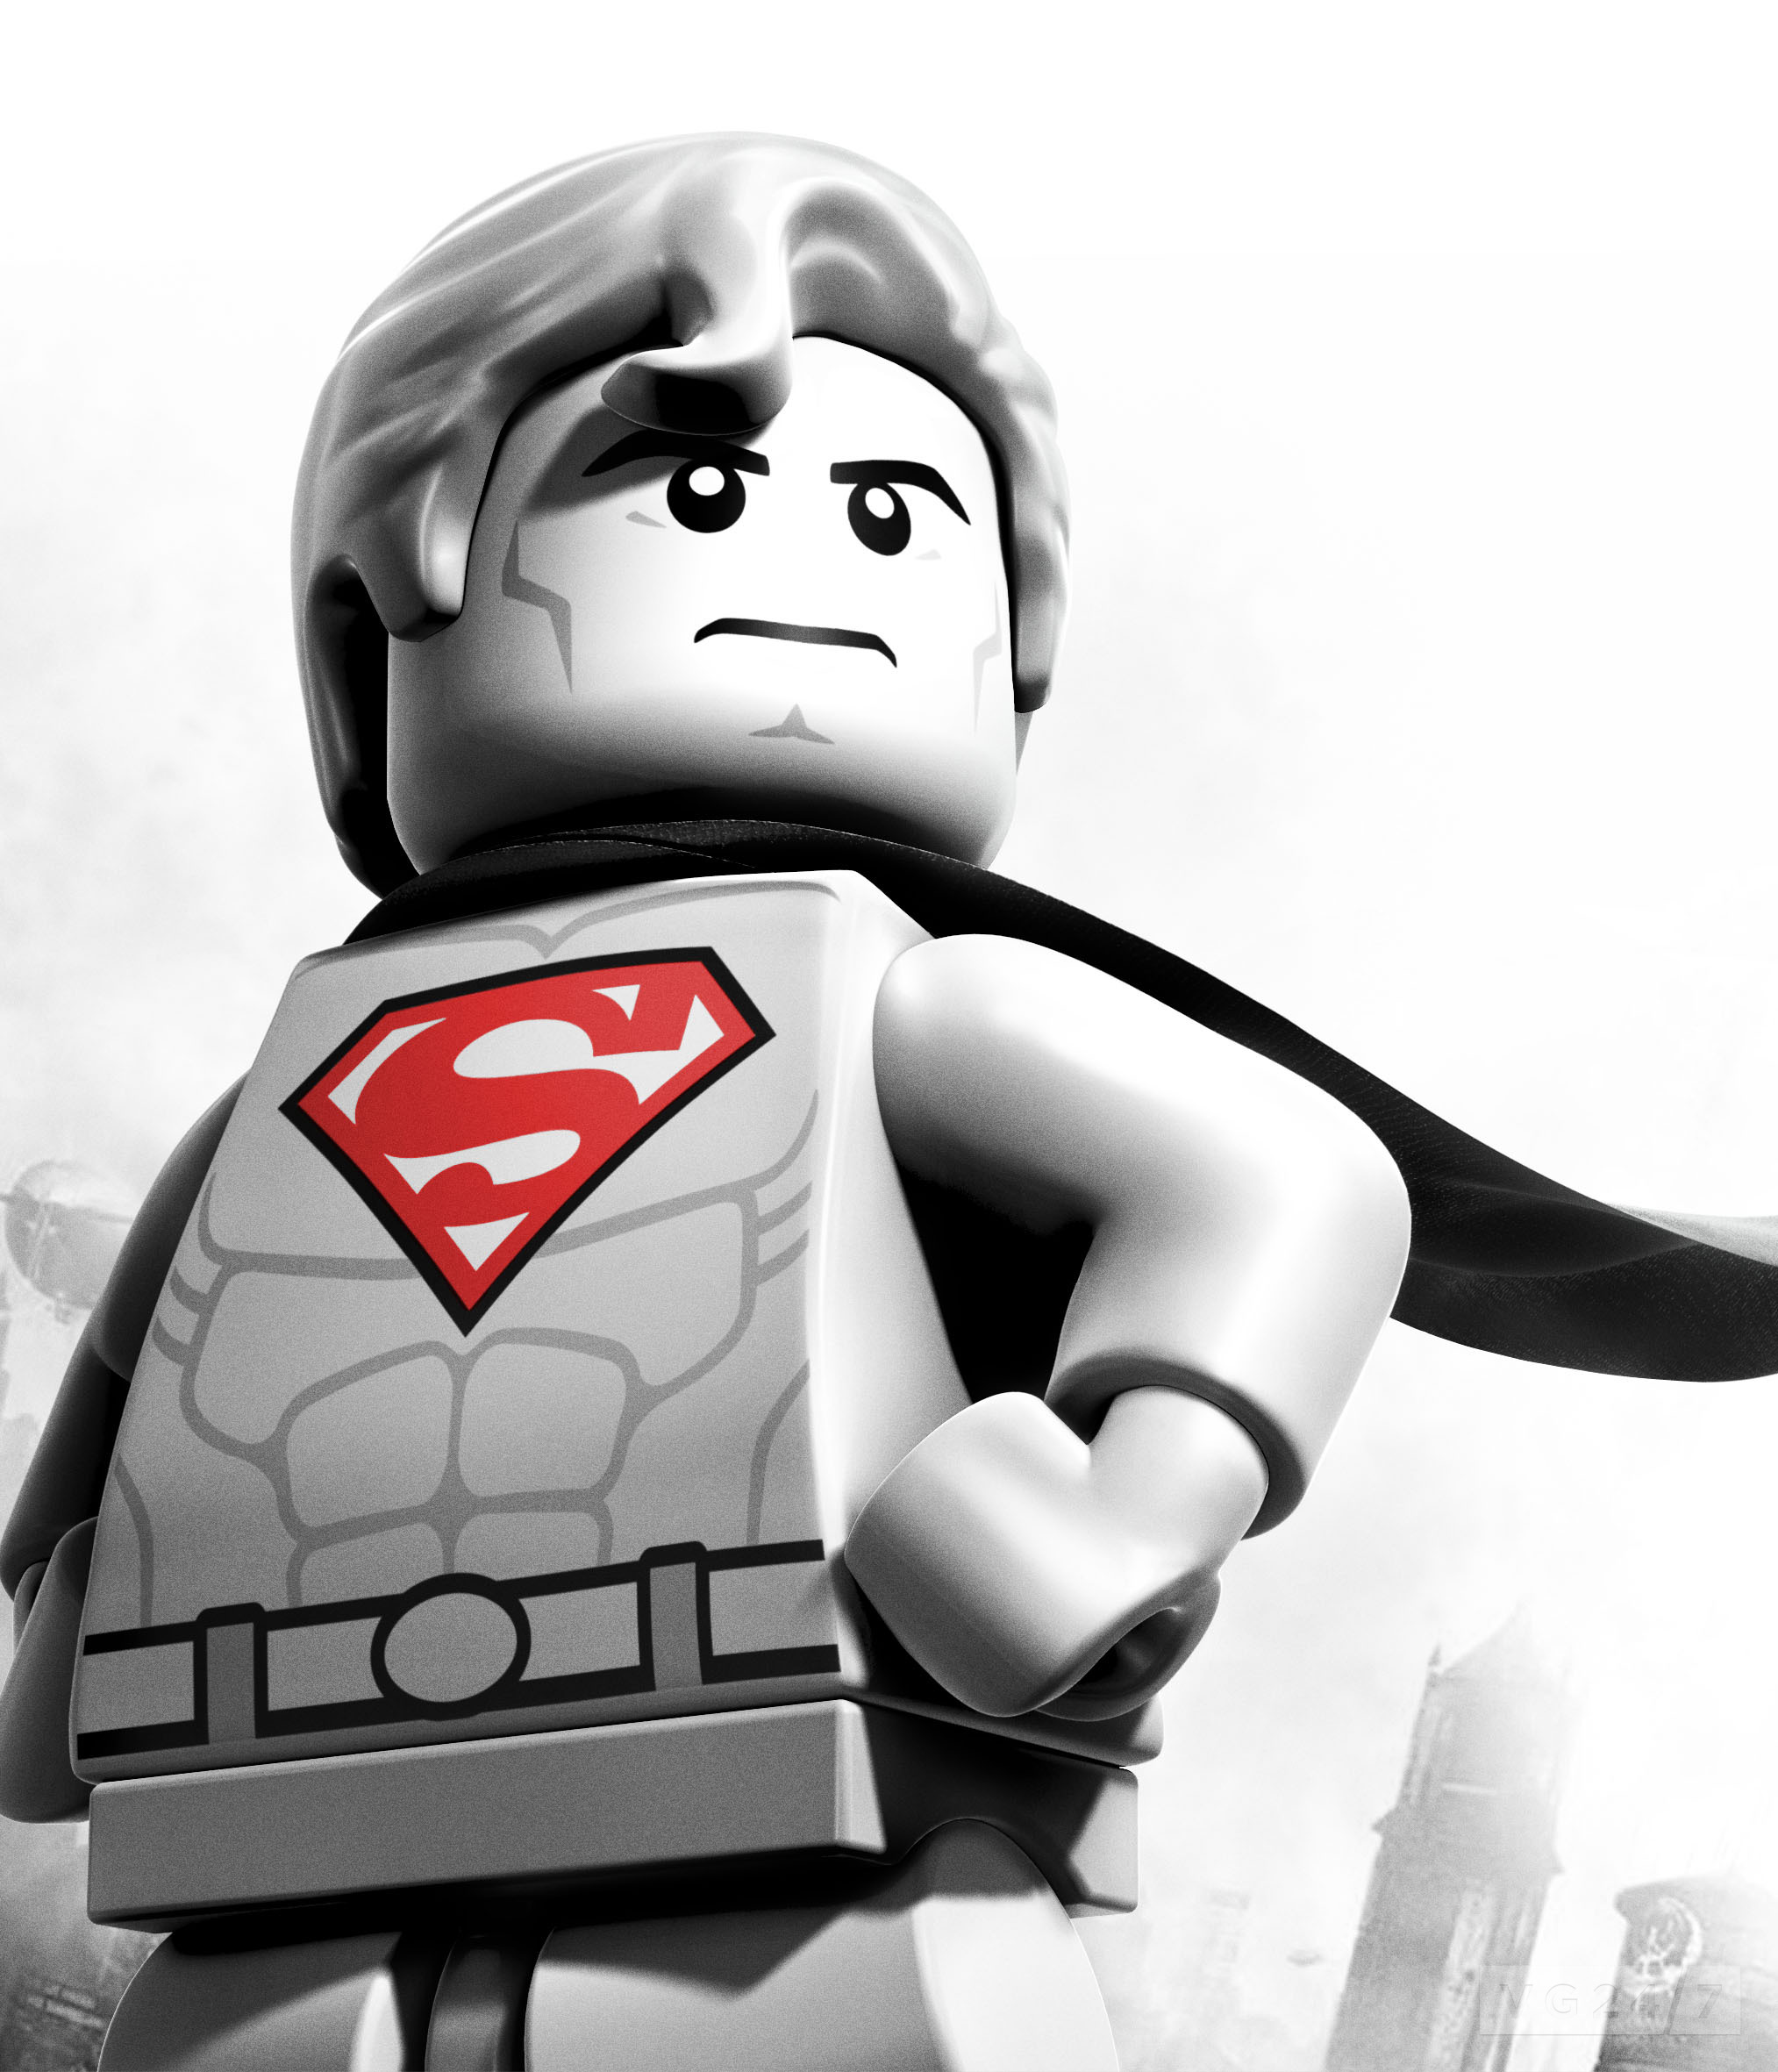 http://img4.wikia.nocookie.net/__cb20120516151021/lego/images/0/0a/LB2_Superman_BAC-Parody_Final_040312-133x156.jpg